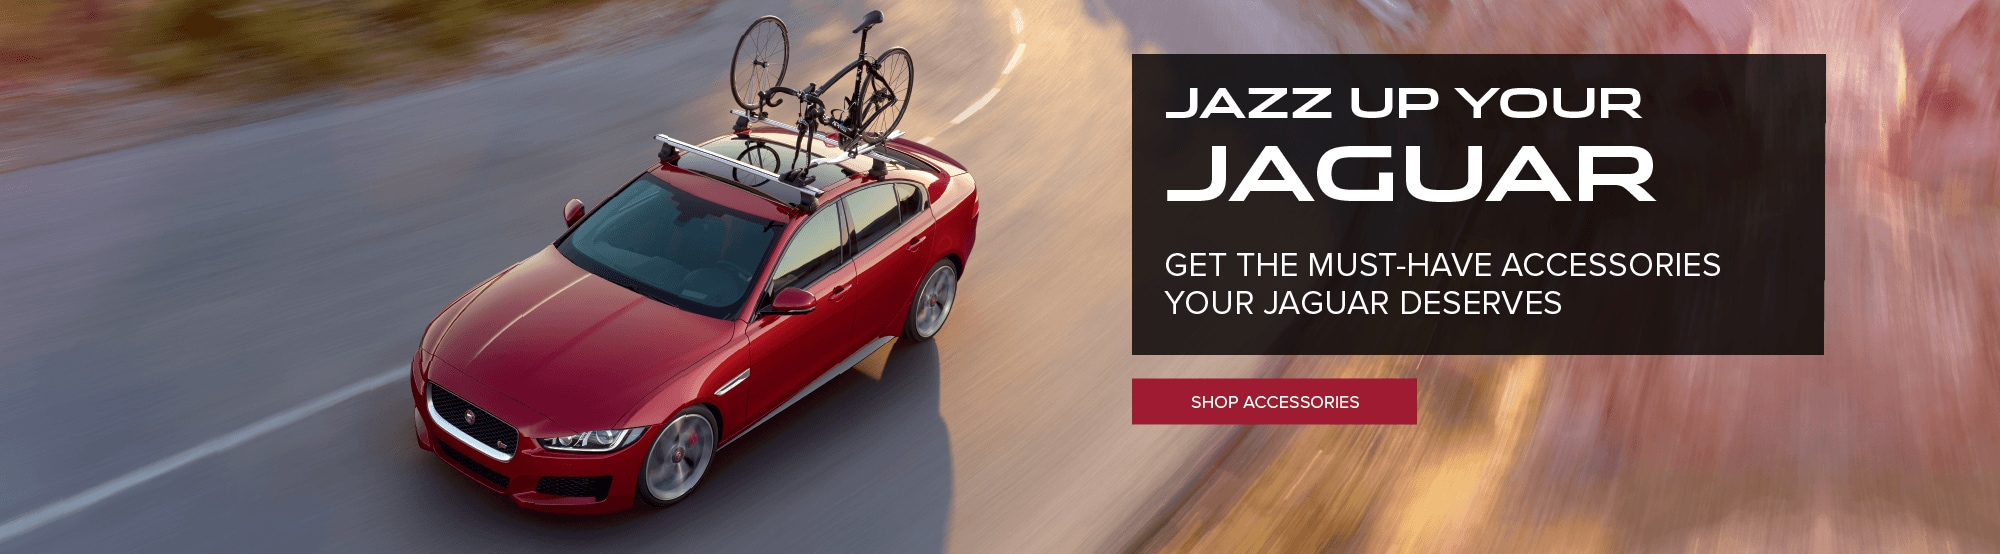 Specialized Jaguar Accessories